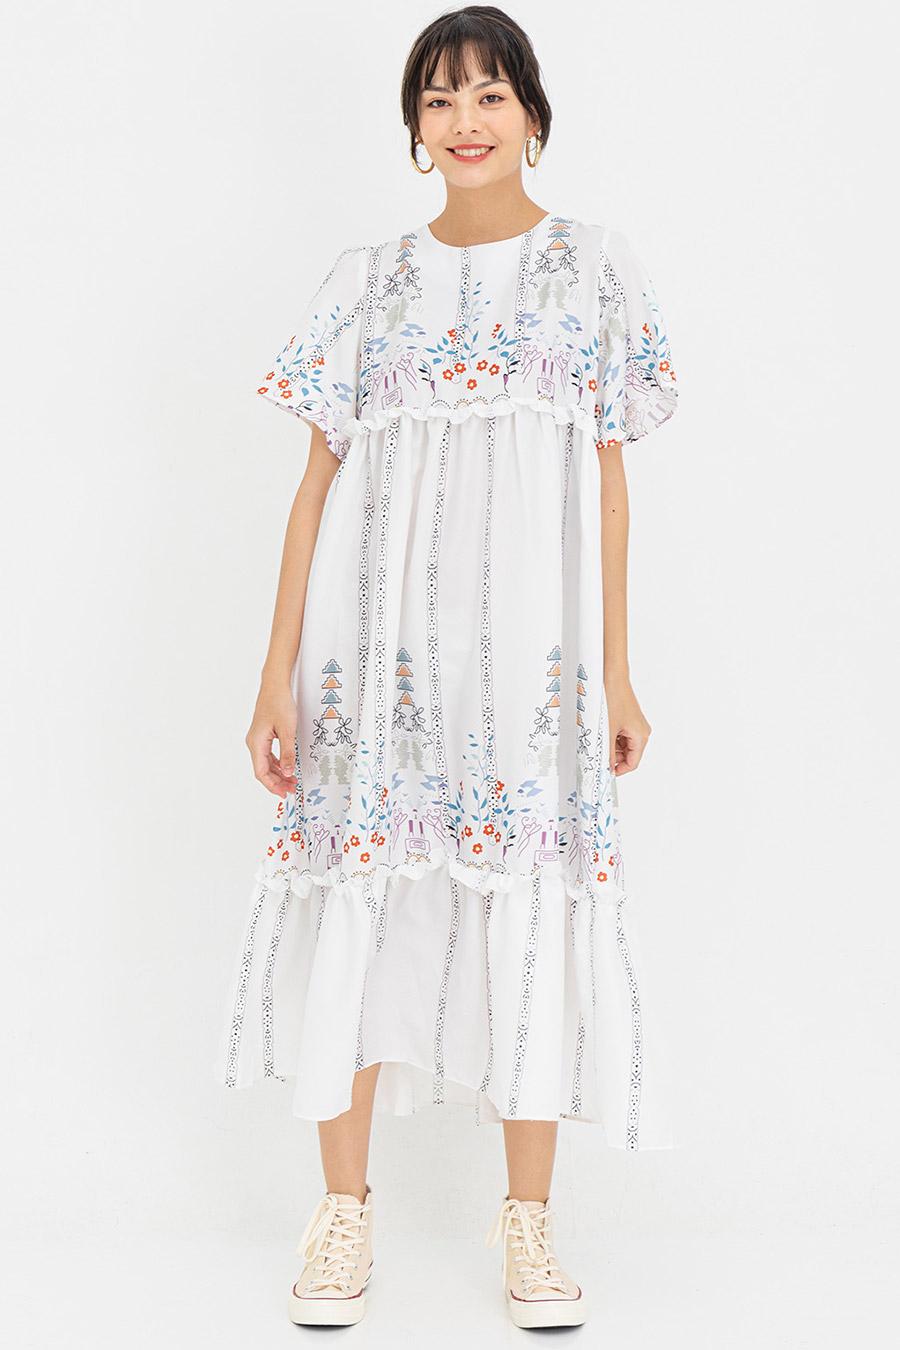 TIFFANIE DRESS - IVORY FLEUR